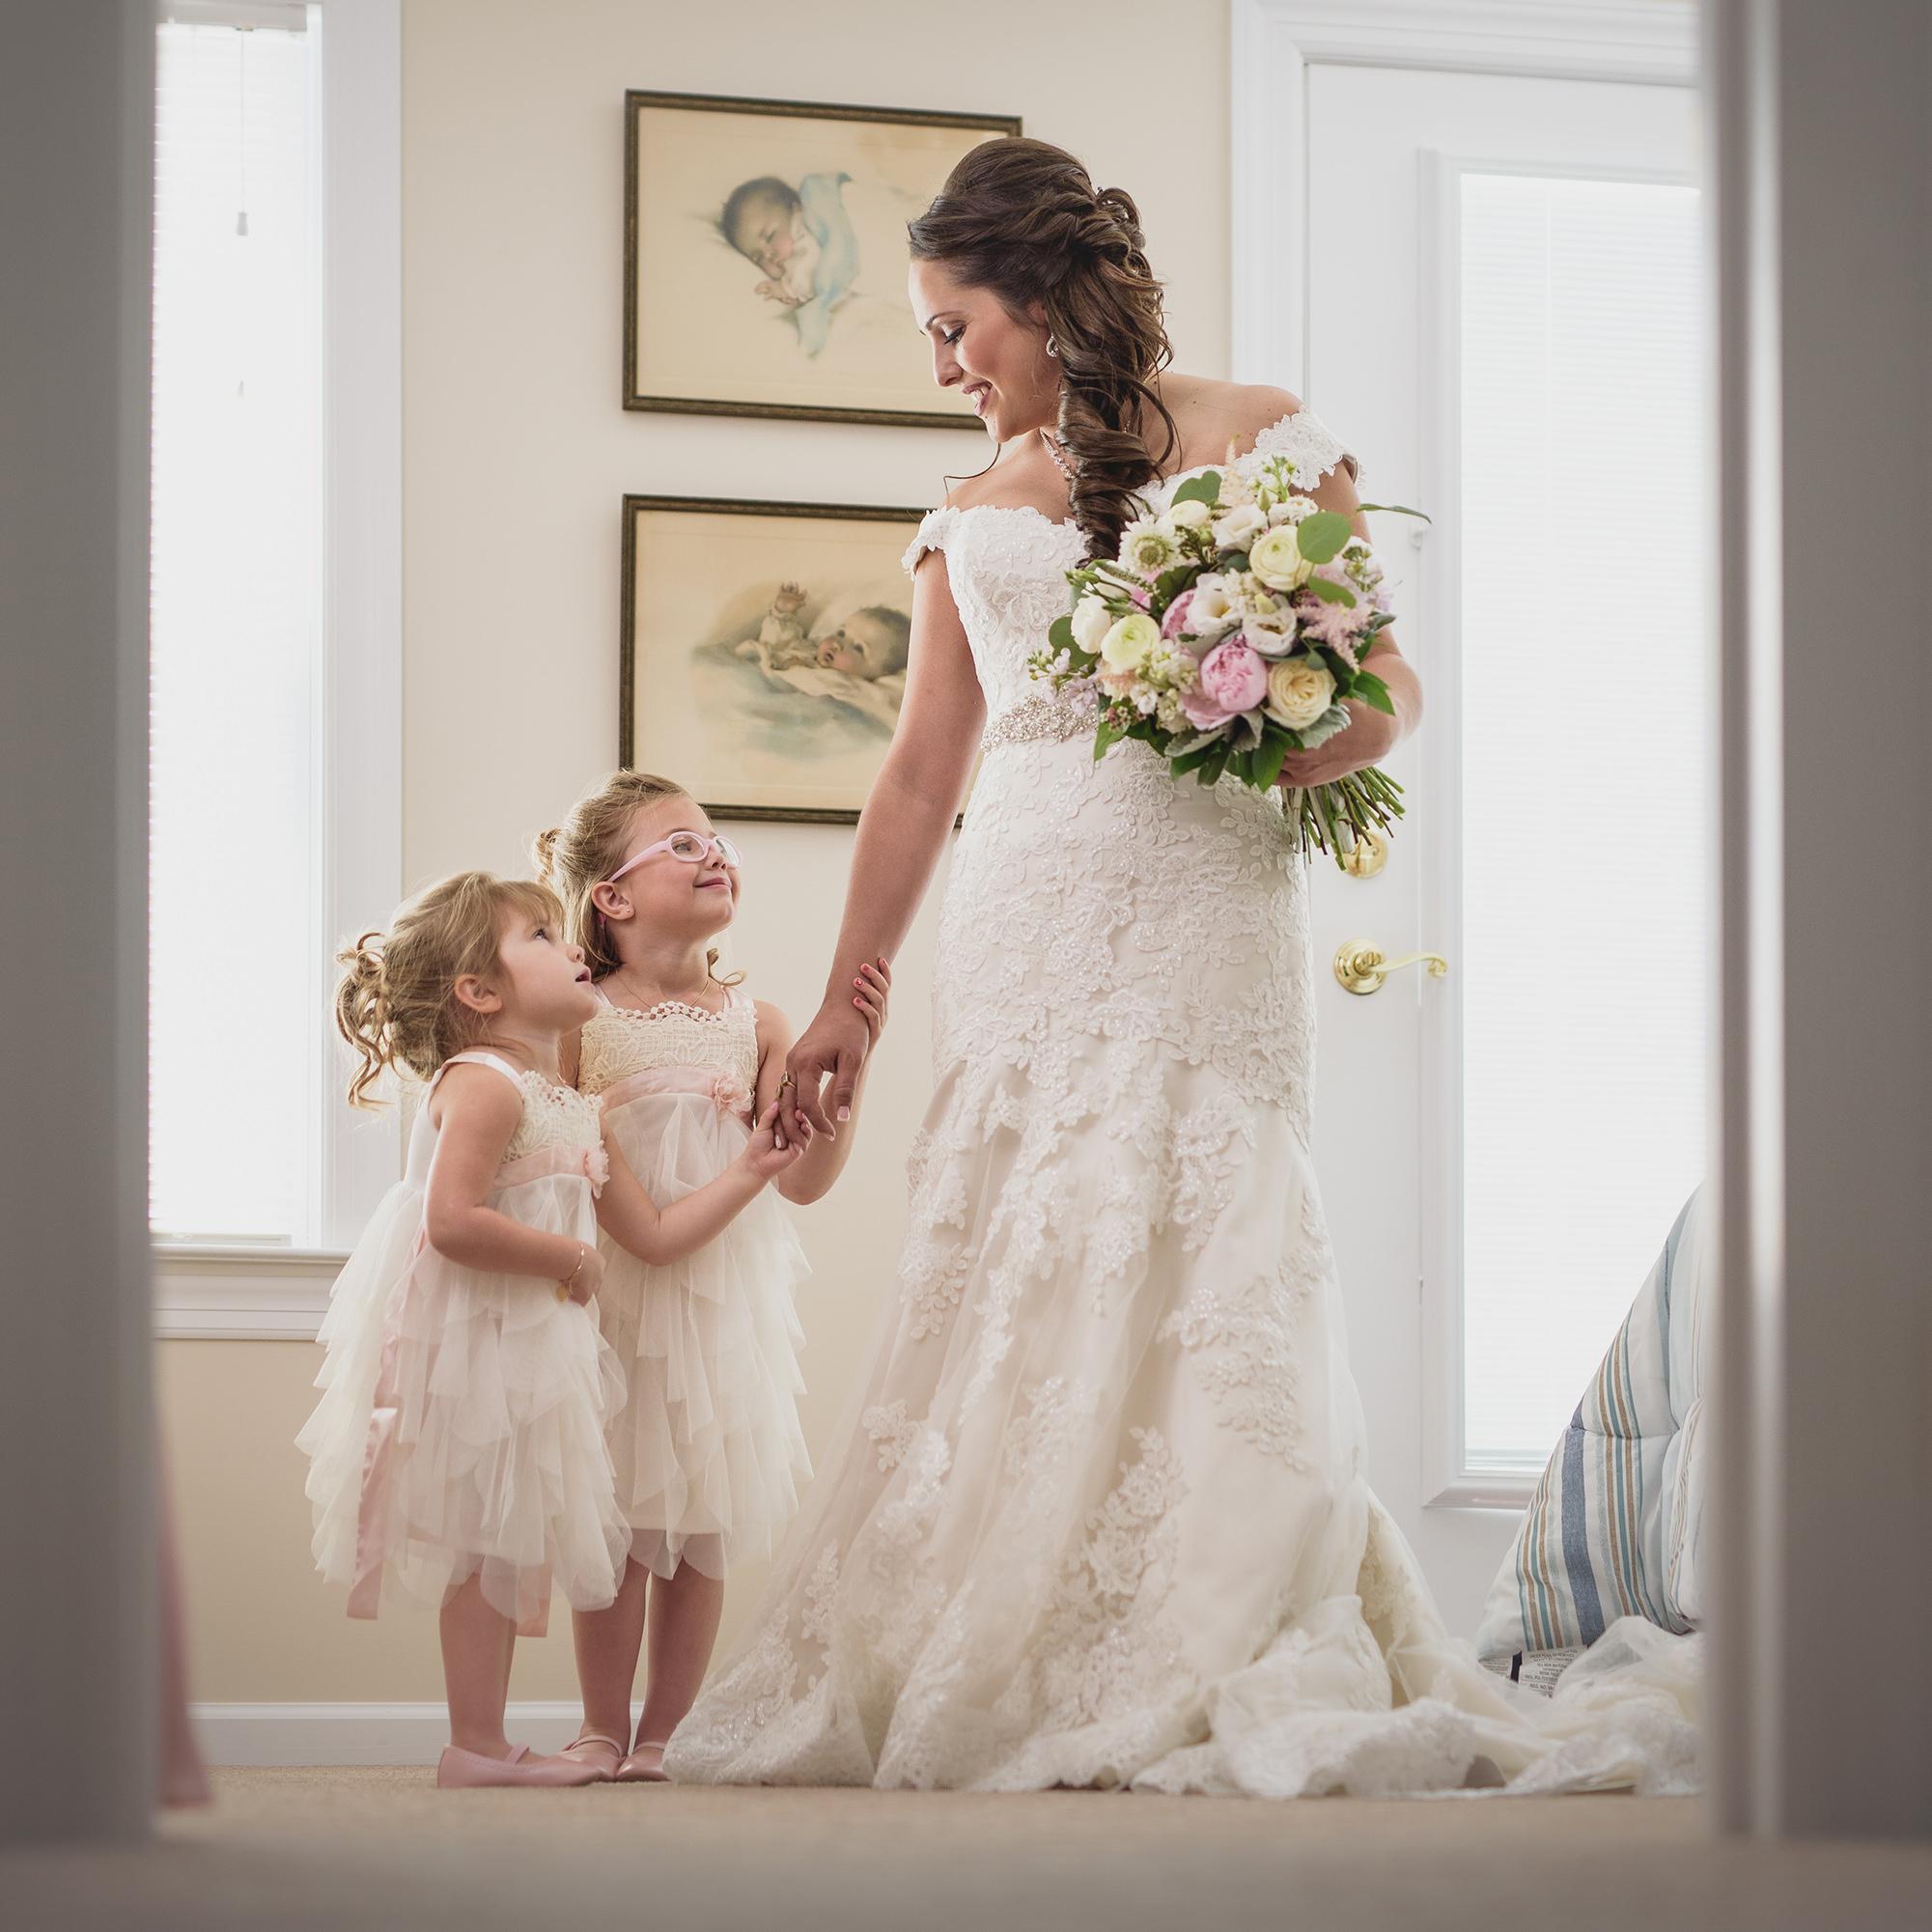 Bride looking down holding flowers